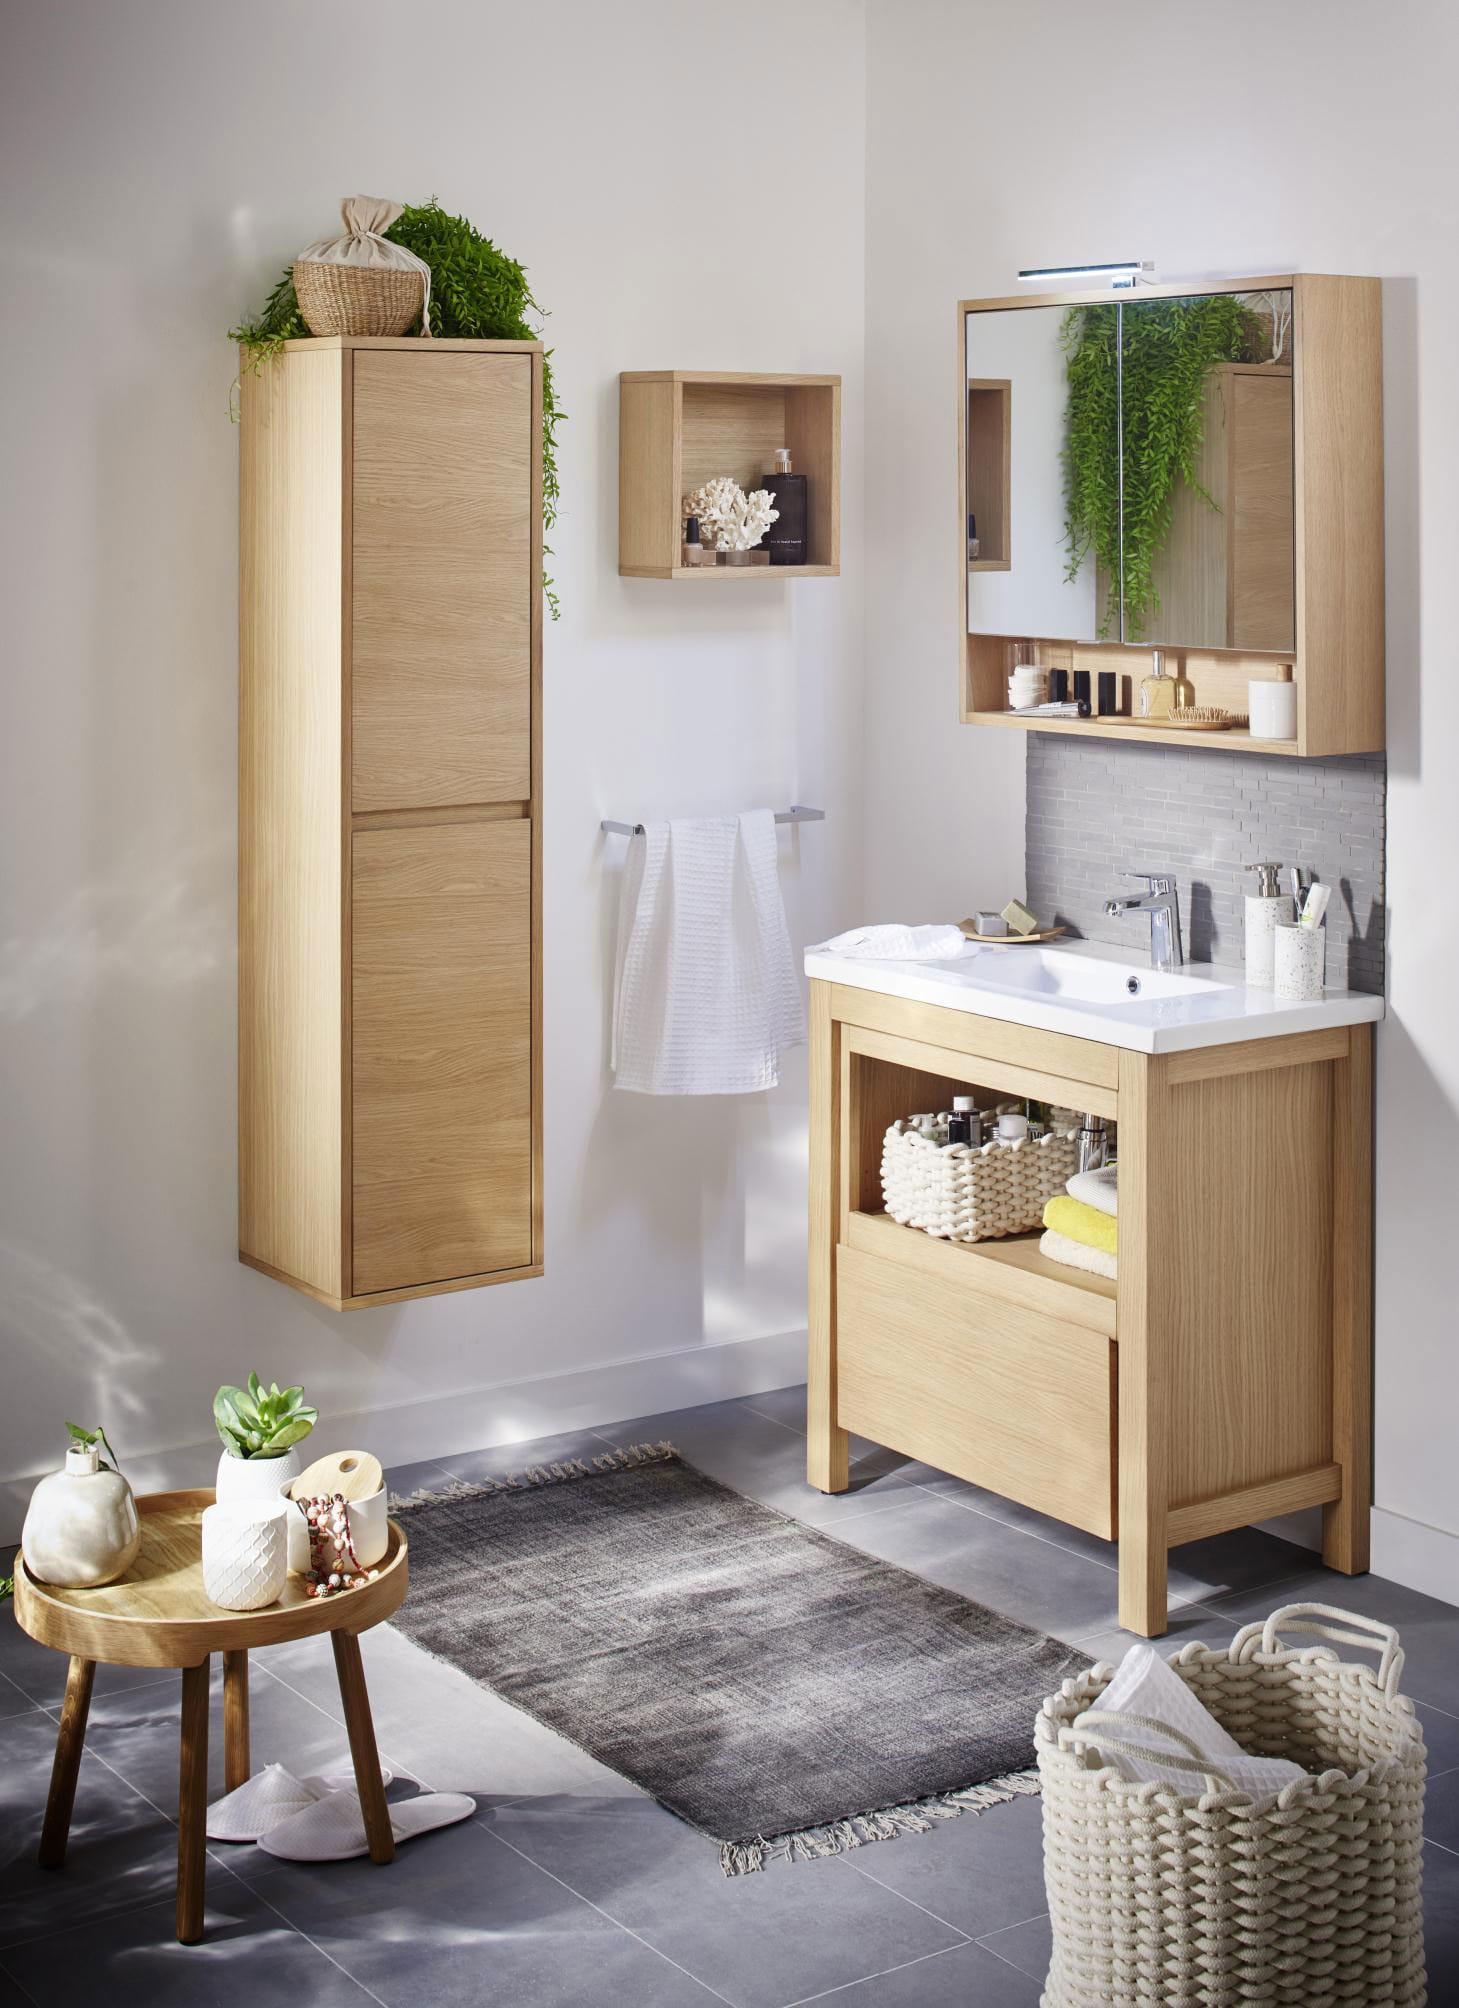 Salle De Bain Nevers ~ inspiration salle de bain et petite salle de bain lapeyre